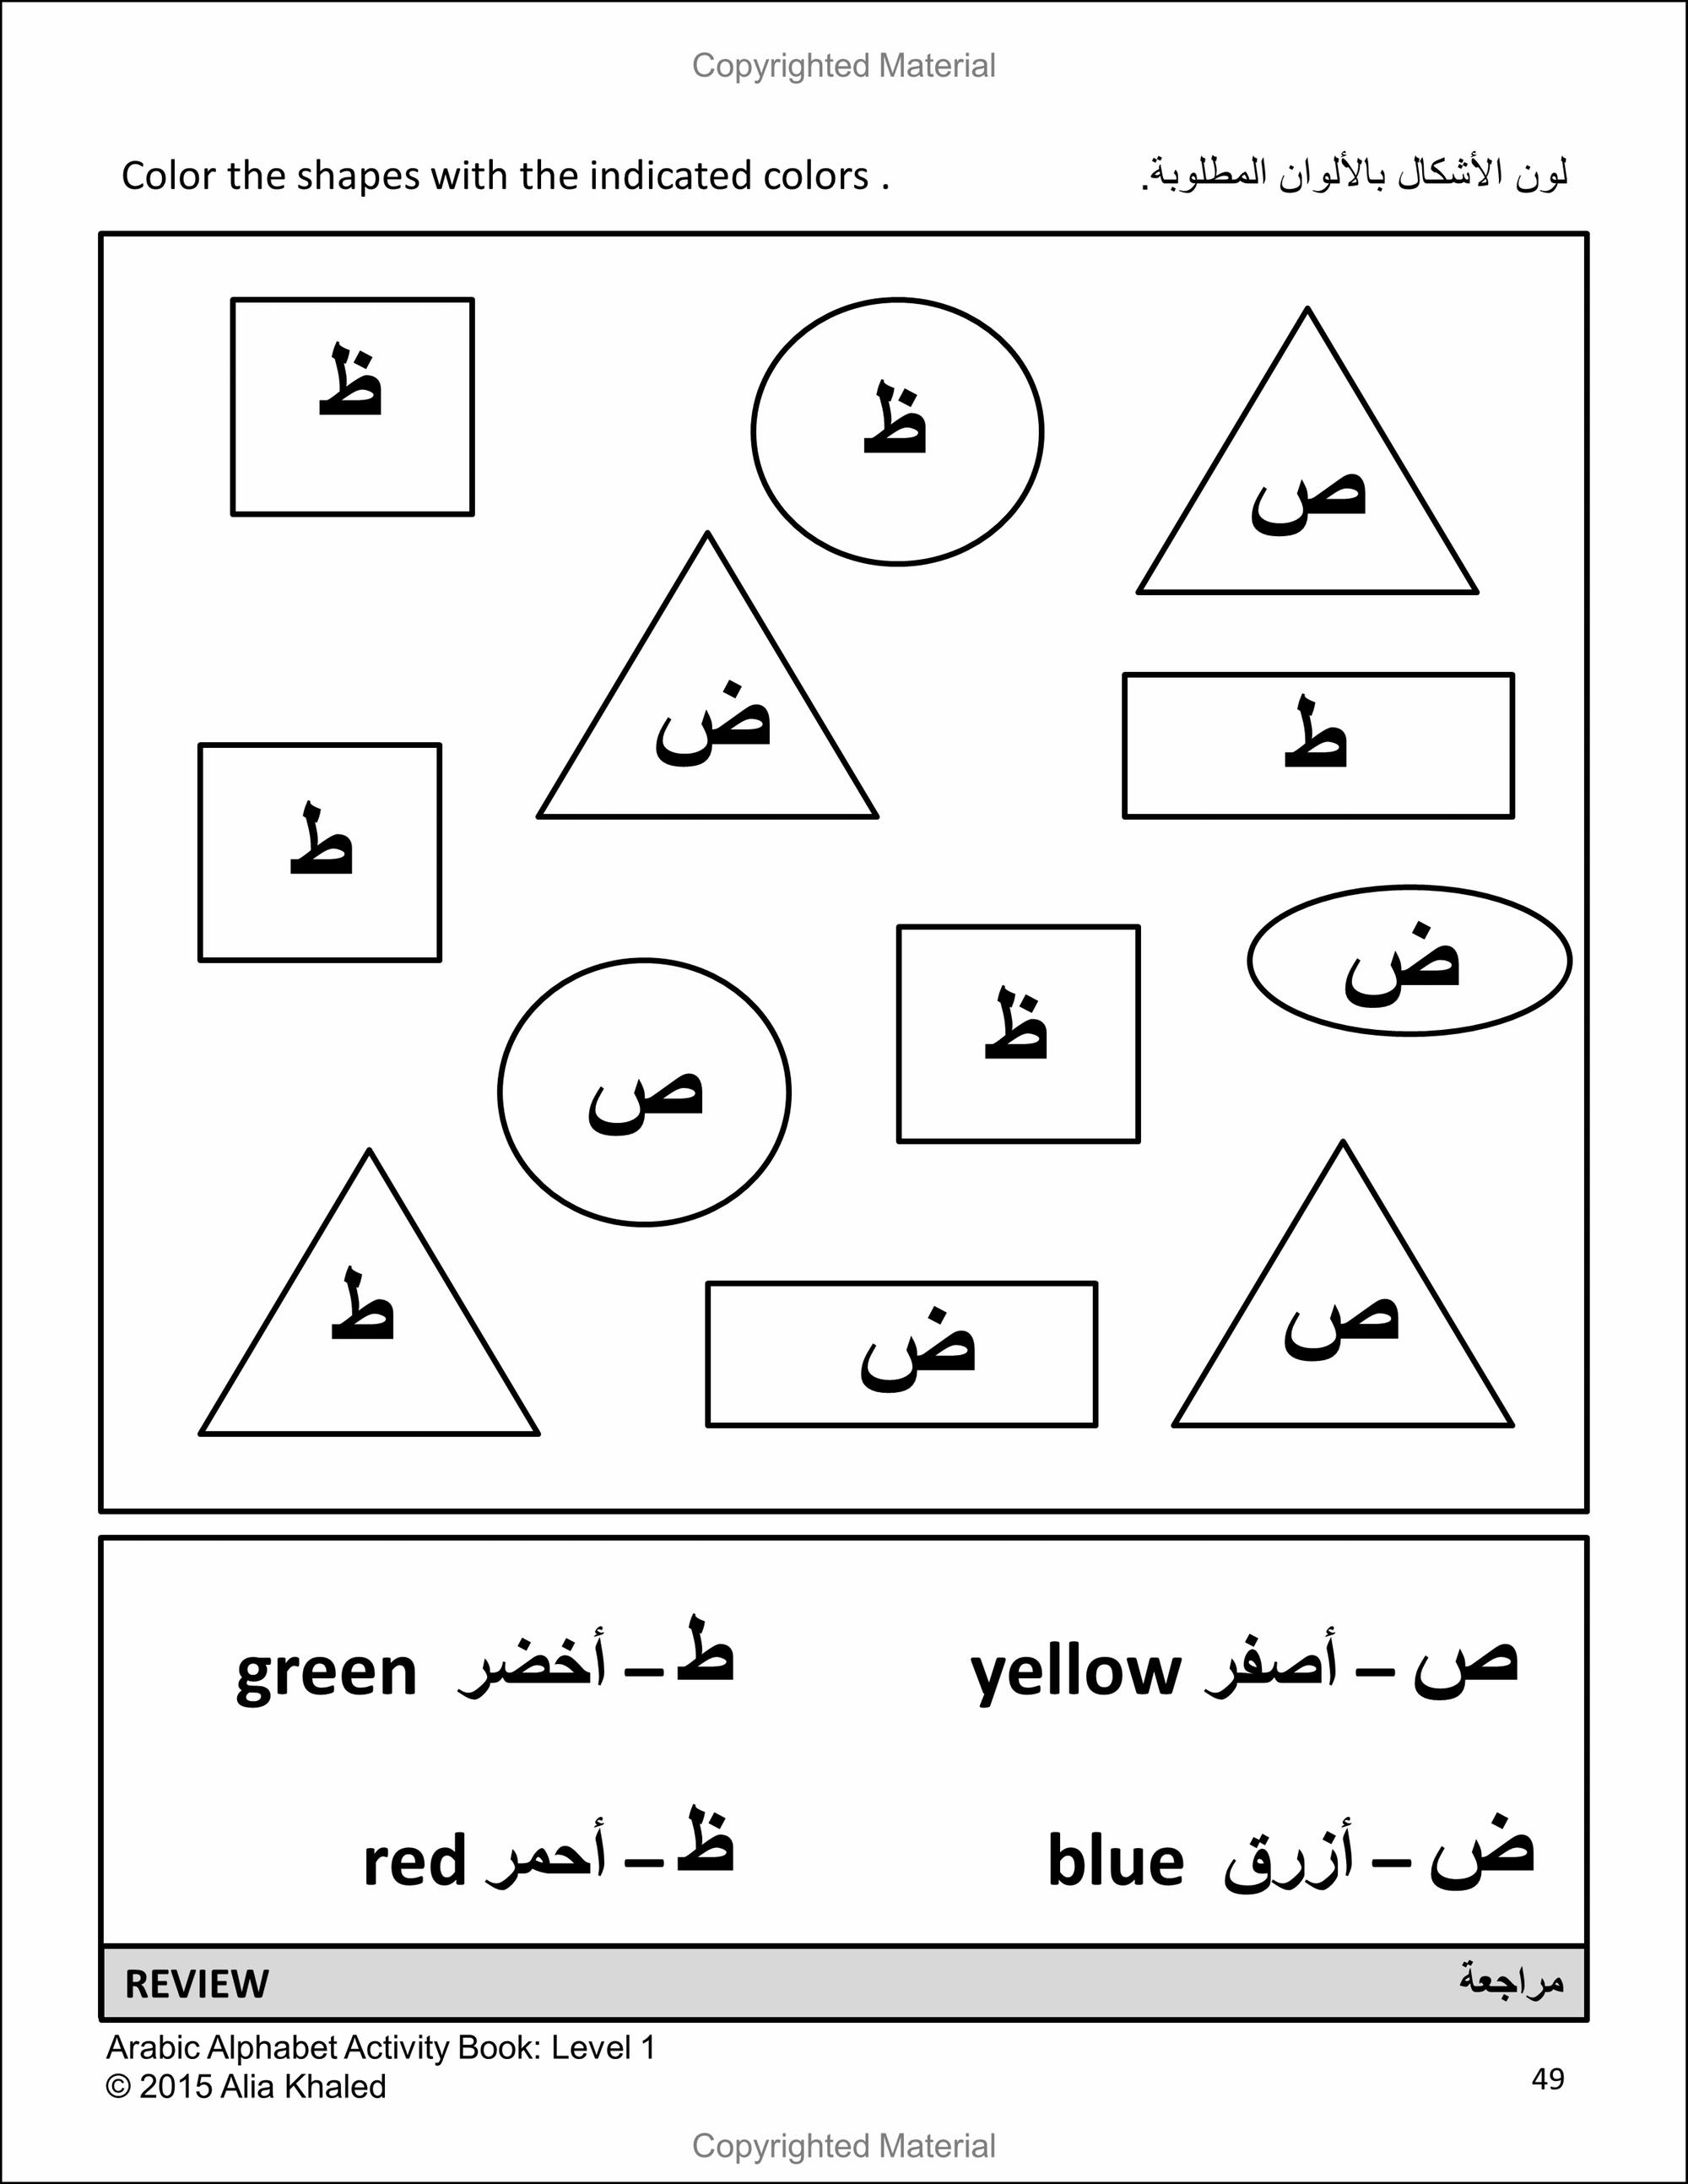 Arabic Alphabet Activity Book Level 1 Black White